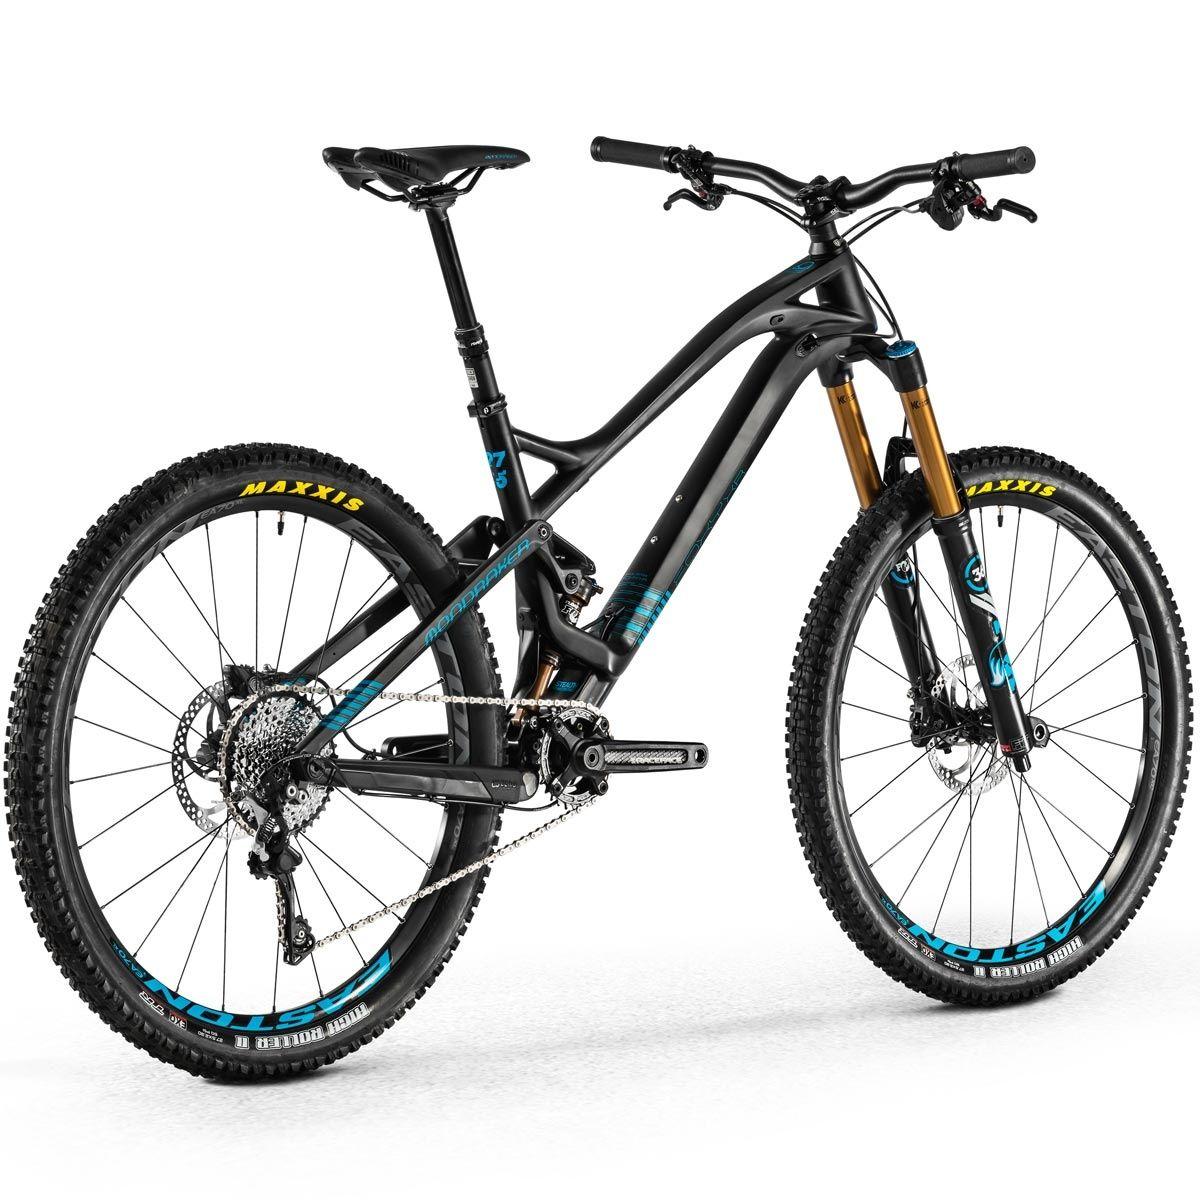 Bicicleta De Montana Mondraker Foxy Carbon Xr Special